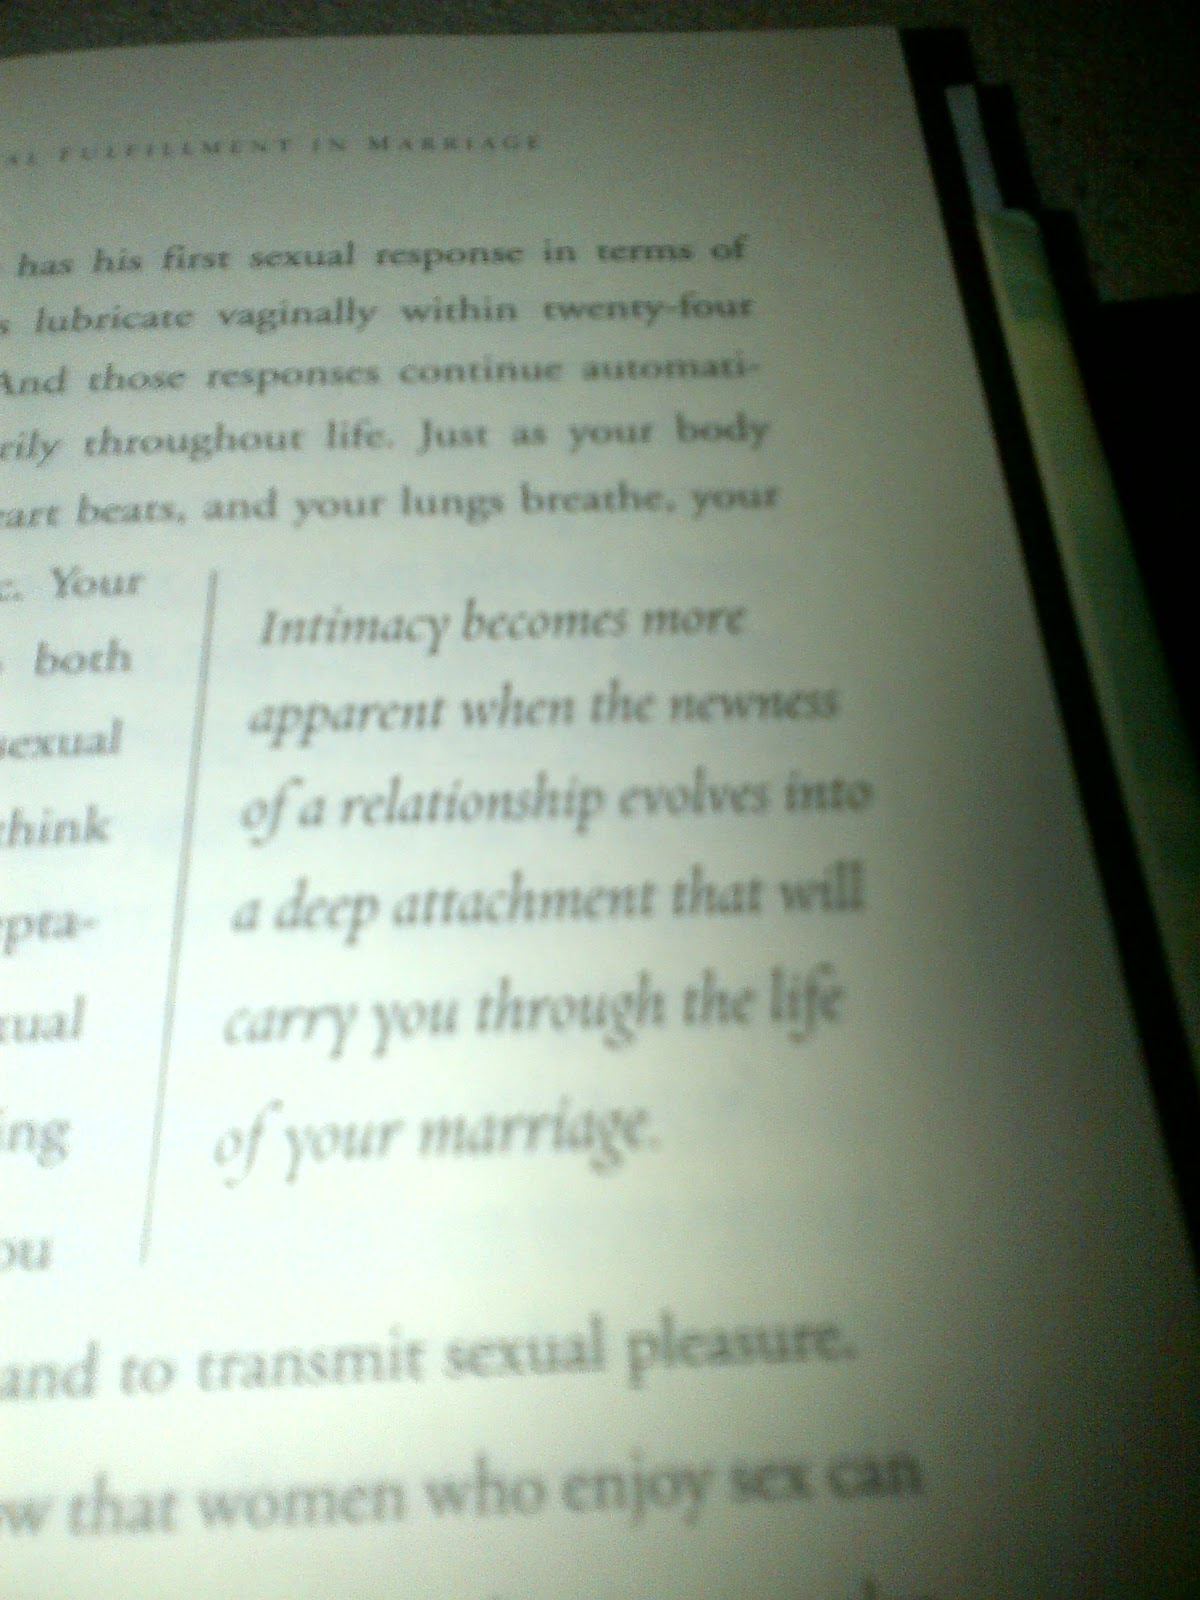 I kissed dating goodbye chapter 3 summary